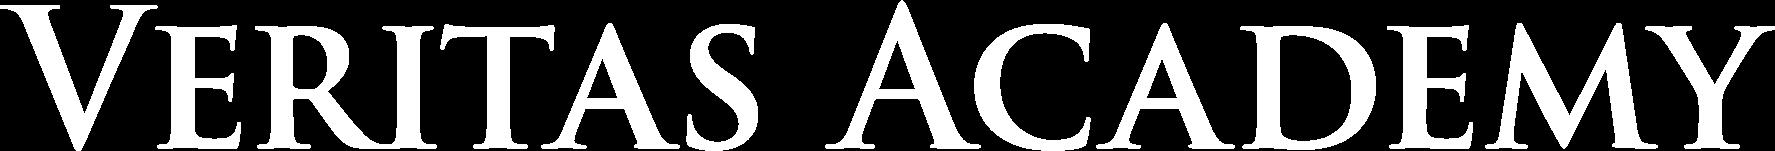 veritas-academy-logotype-inverted-rgb